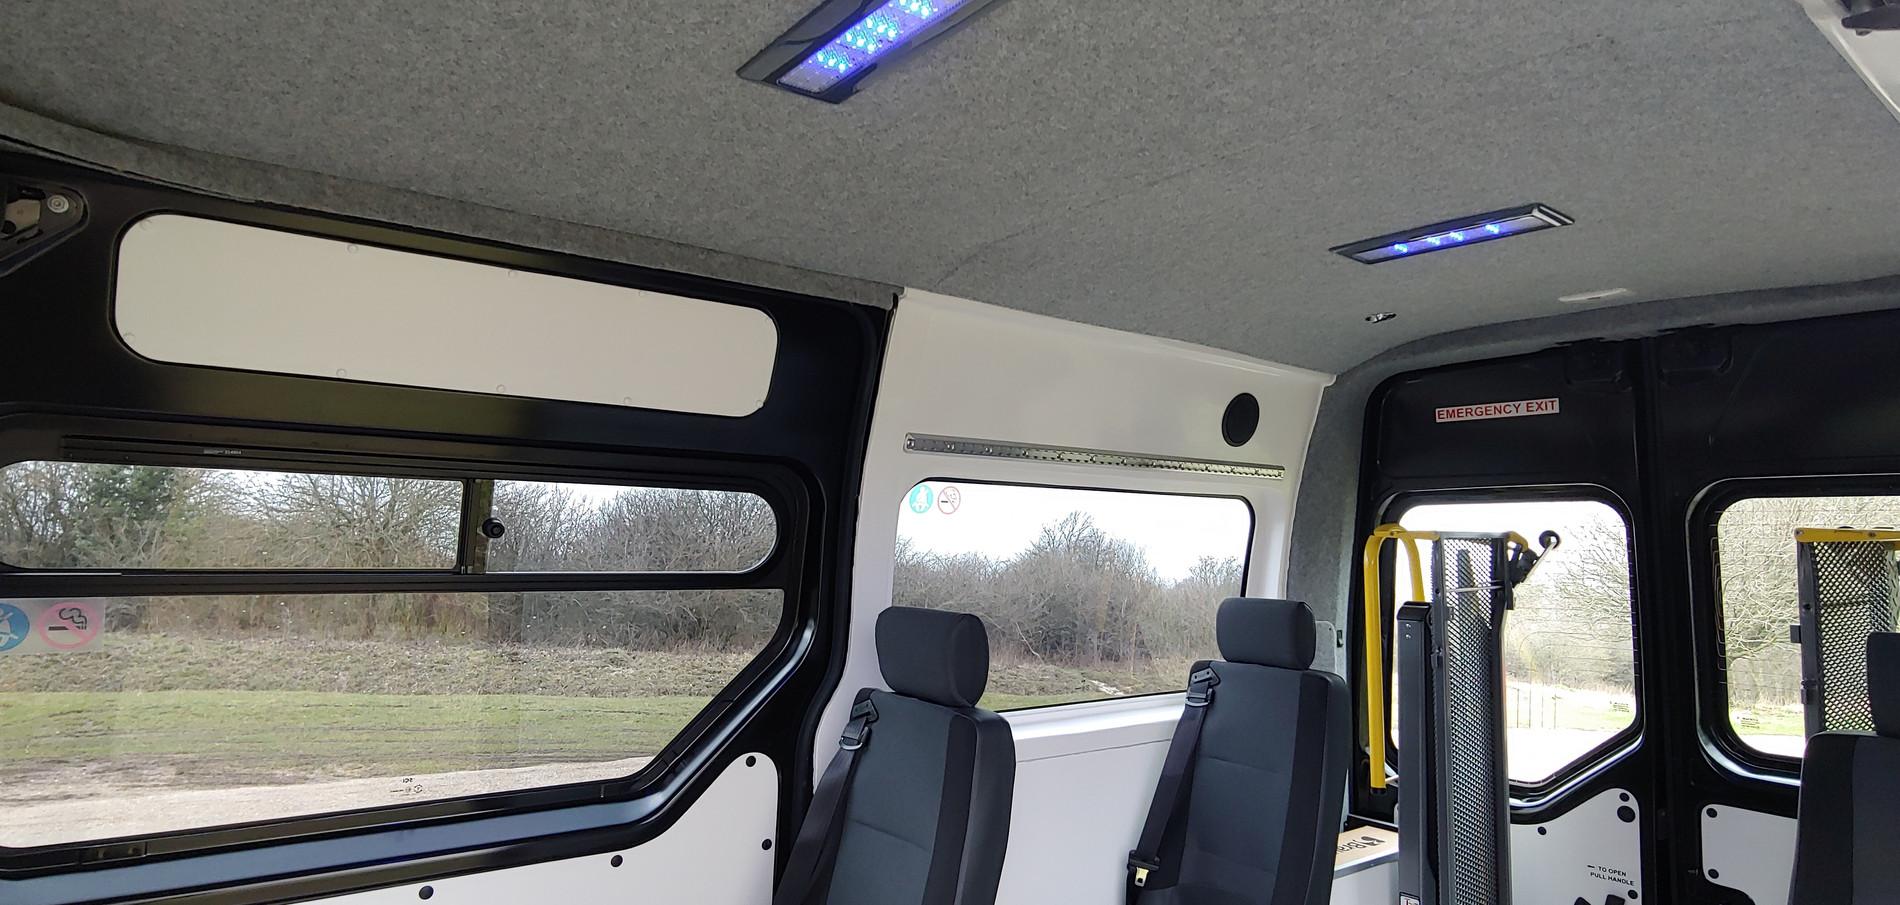 LED lighting in Warnerbus Minibus conversion